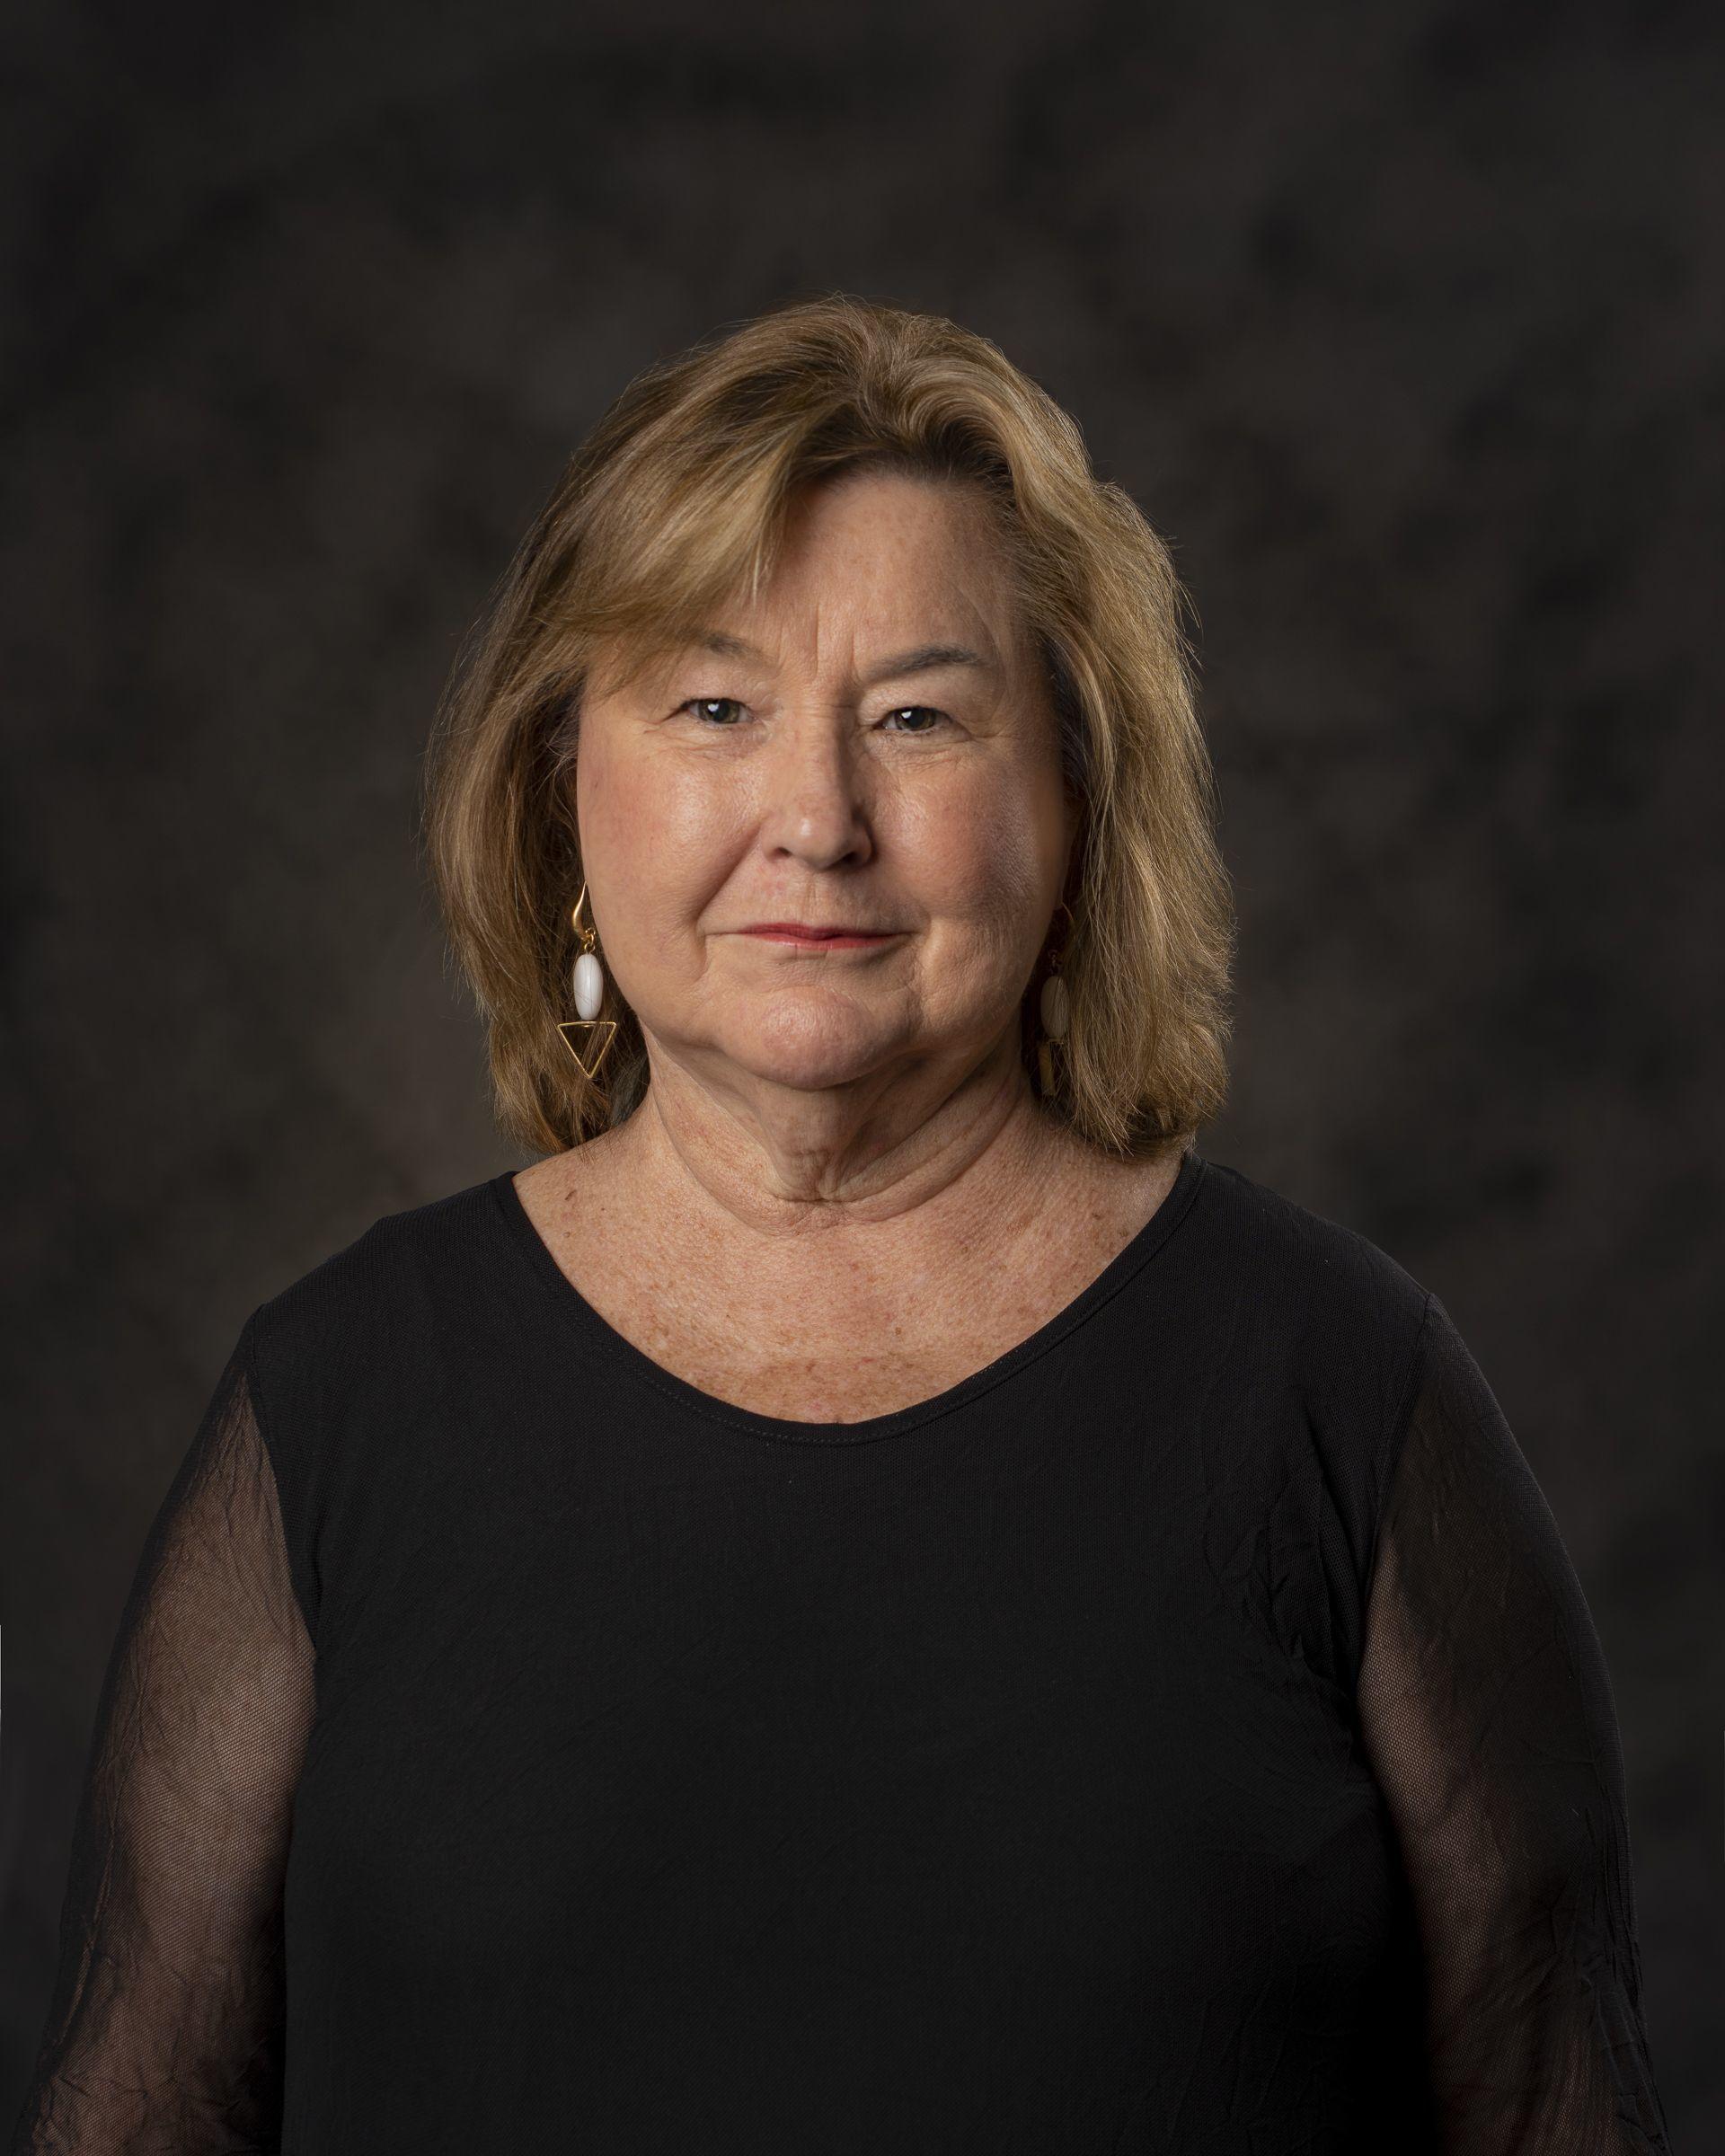 Deborah Walsworth